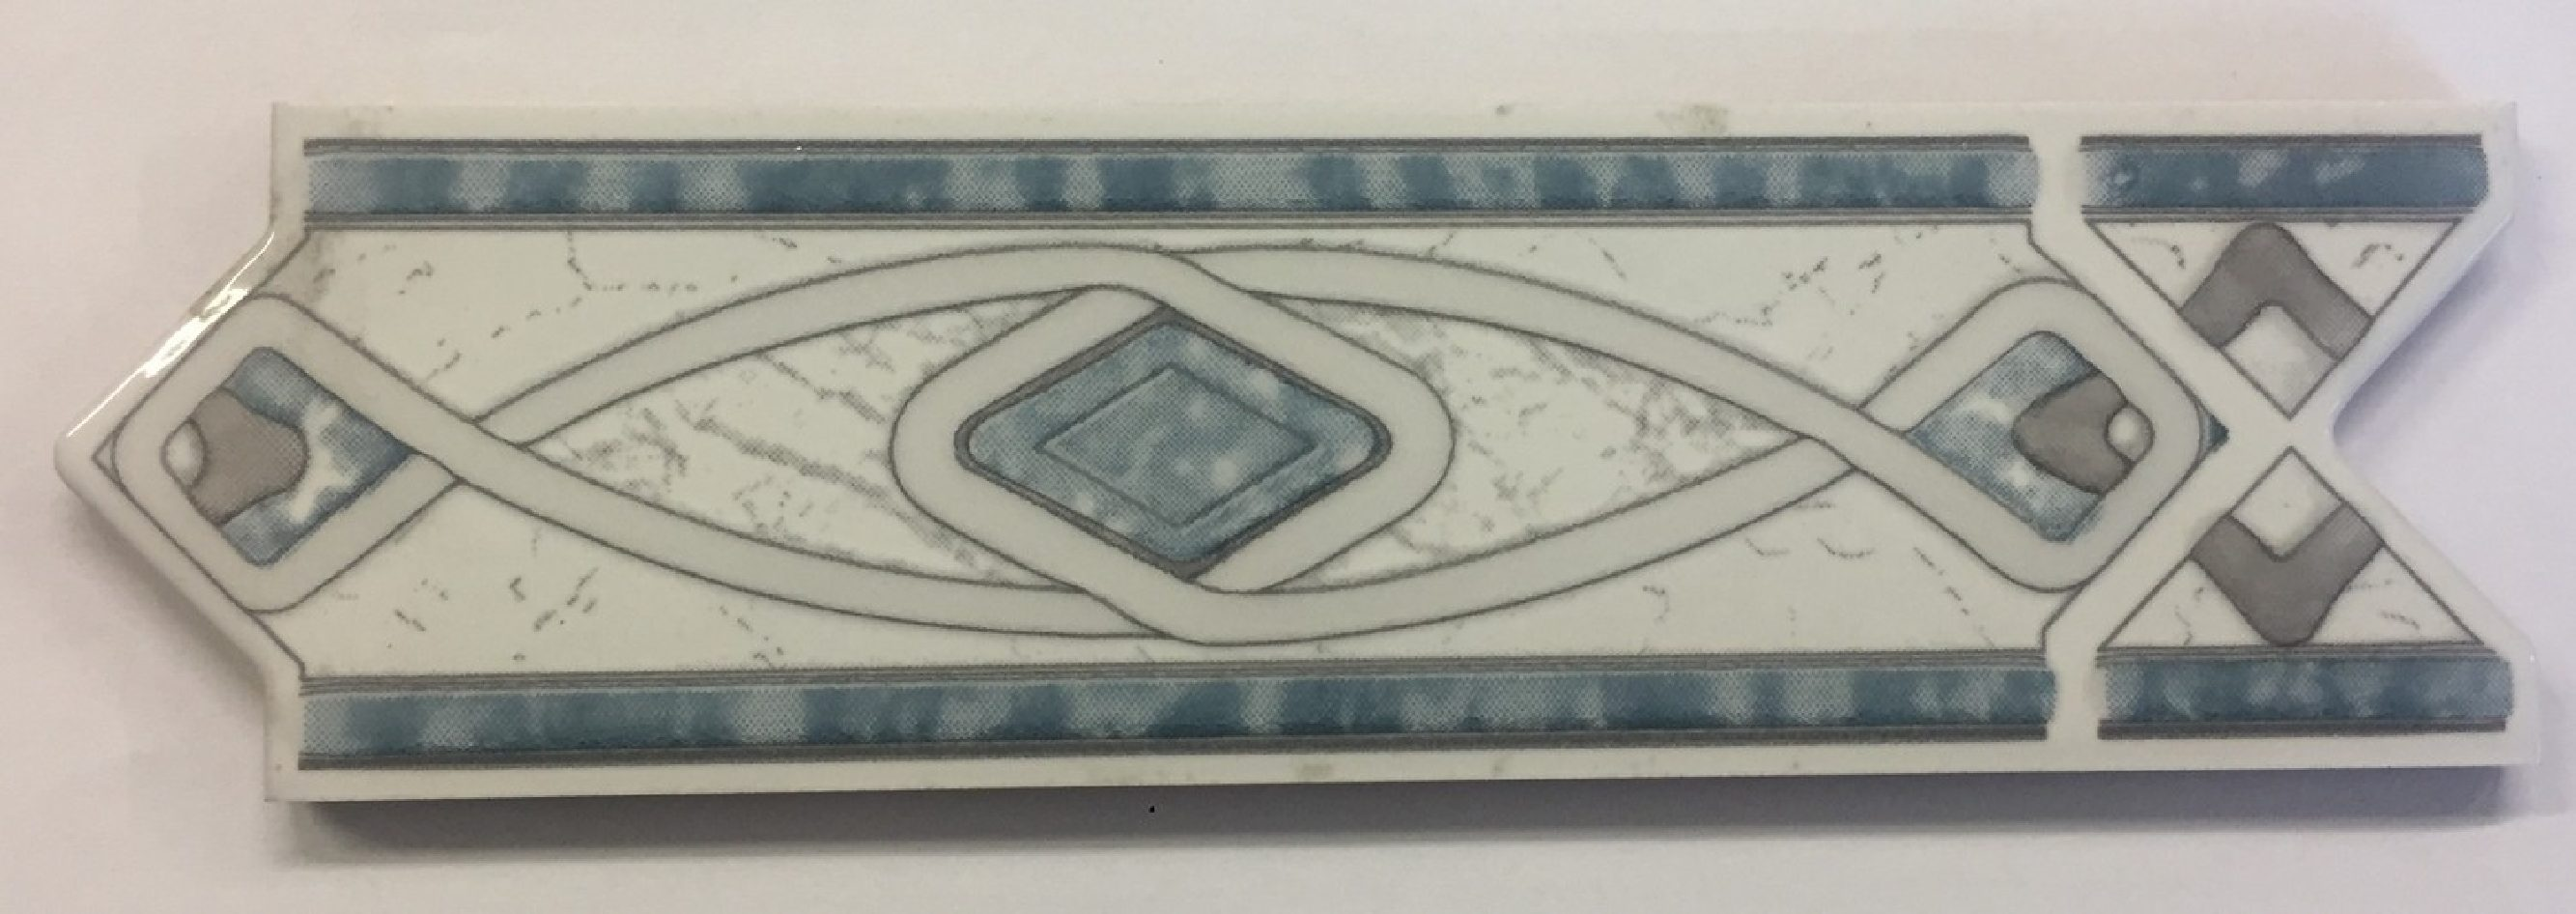 LYON azul endlos 6×20 DOPRODEJ